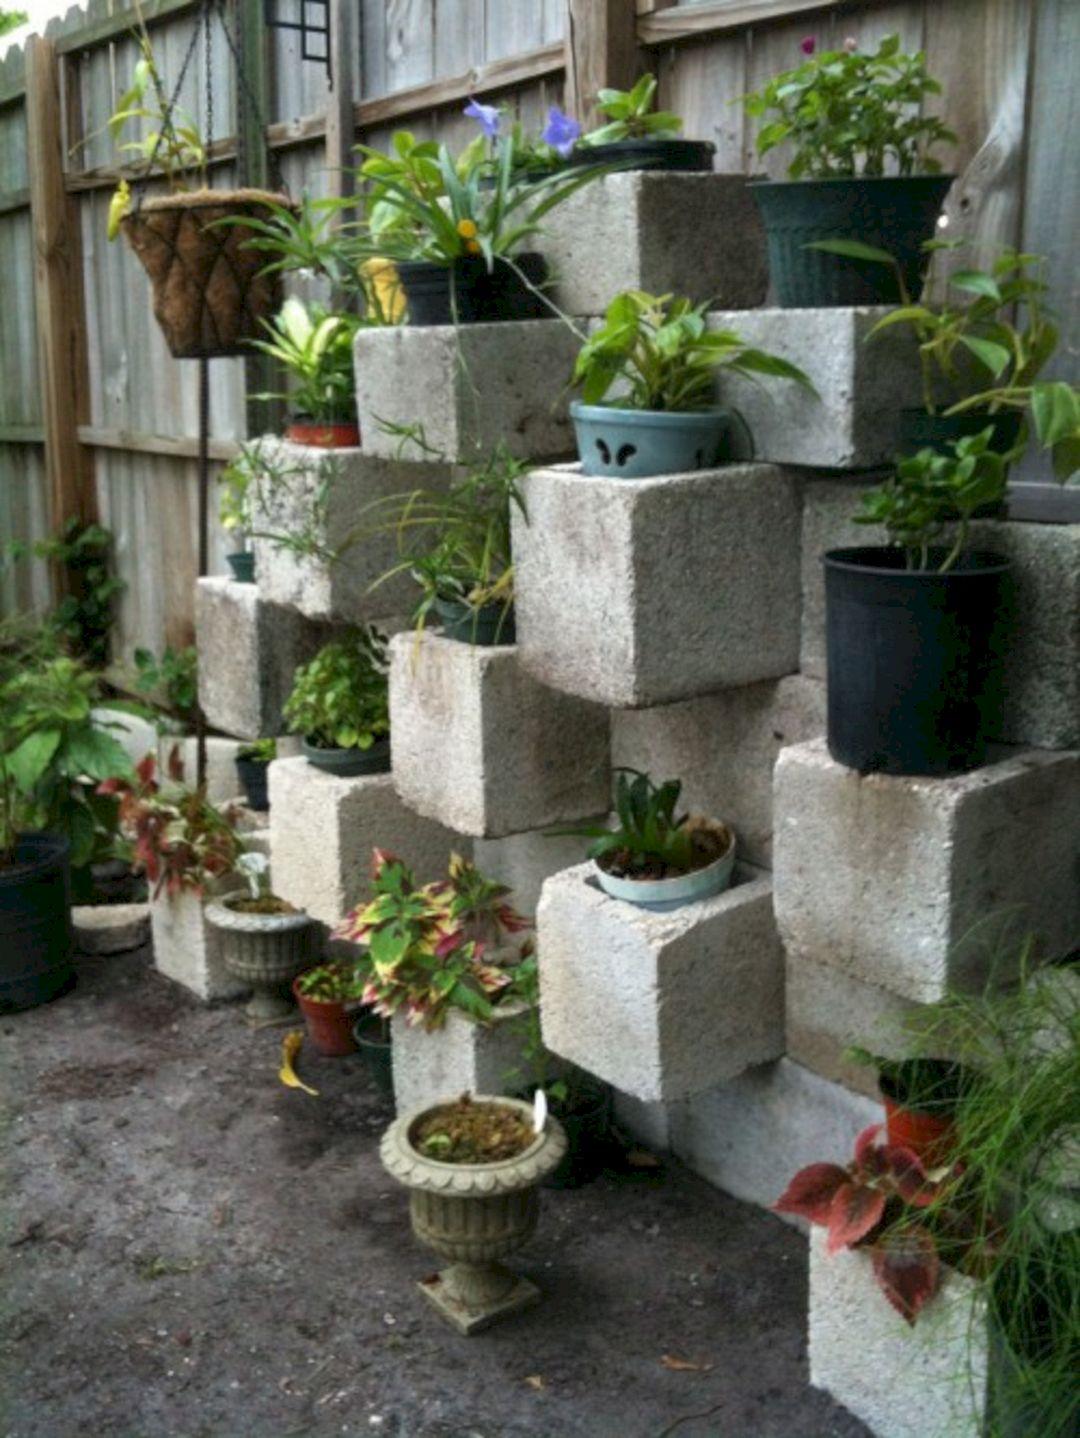 cinder block garden idea - Cinder Block Garden Ideas